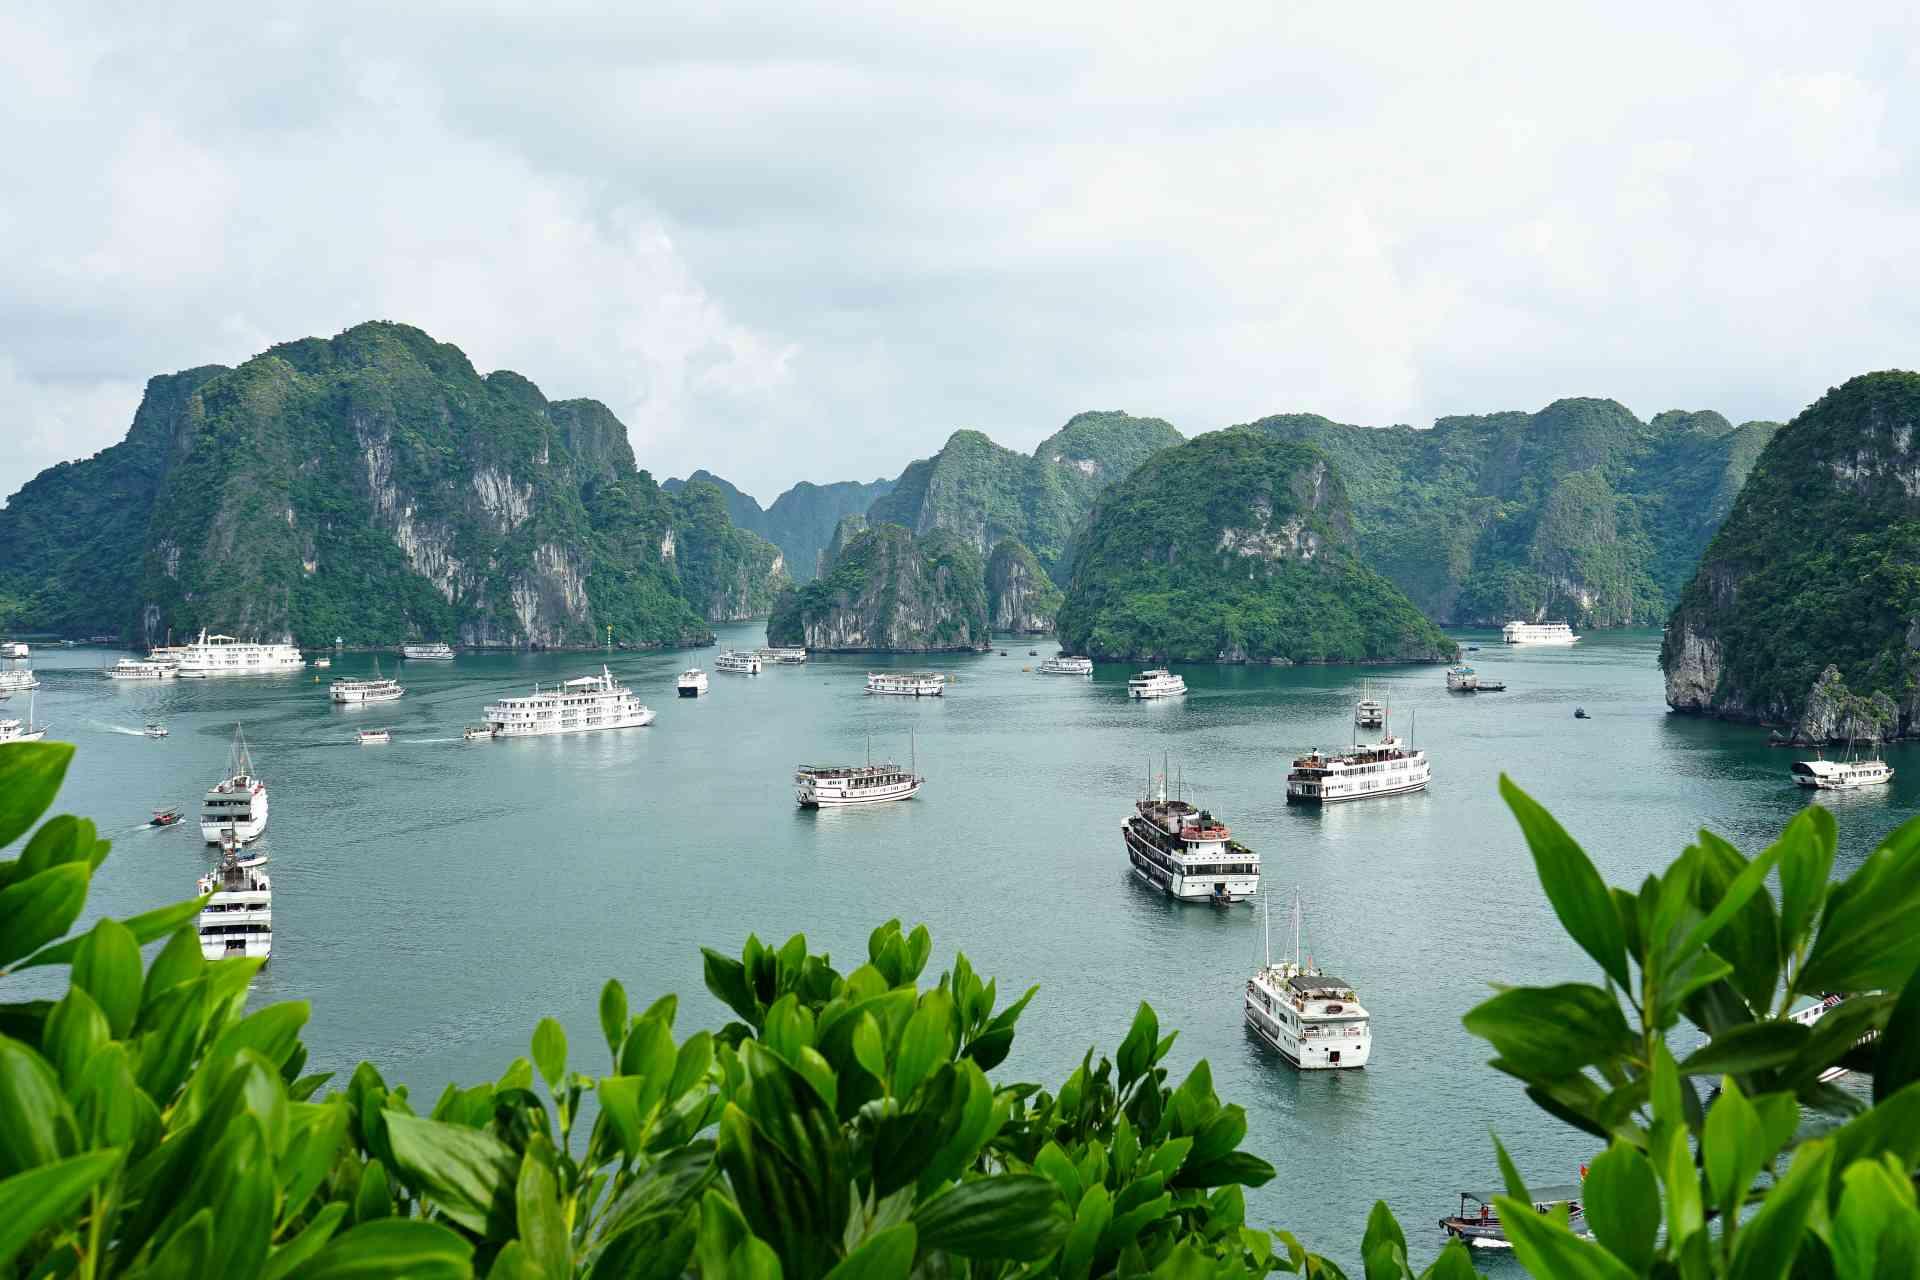 Halong Bay, Vietnam by Priscilla Aster